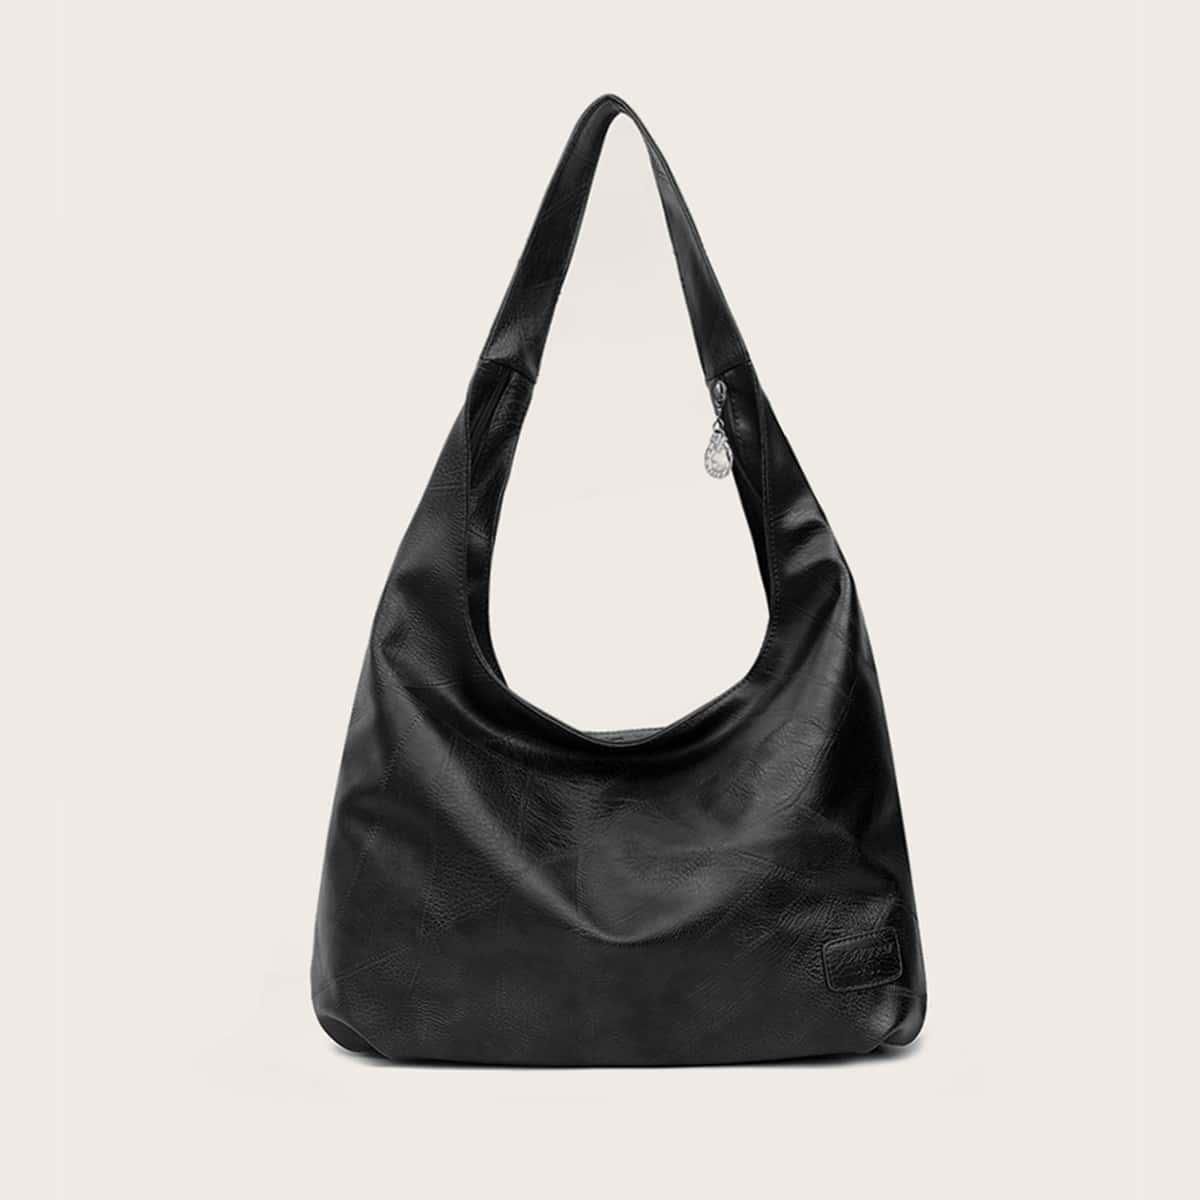 Минималистская сумка-хобо